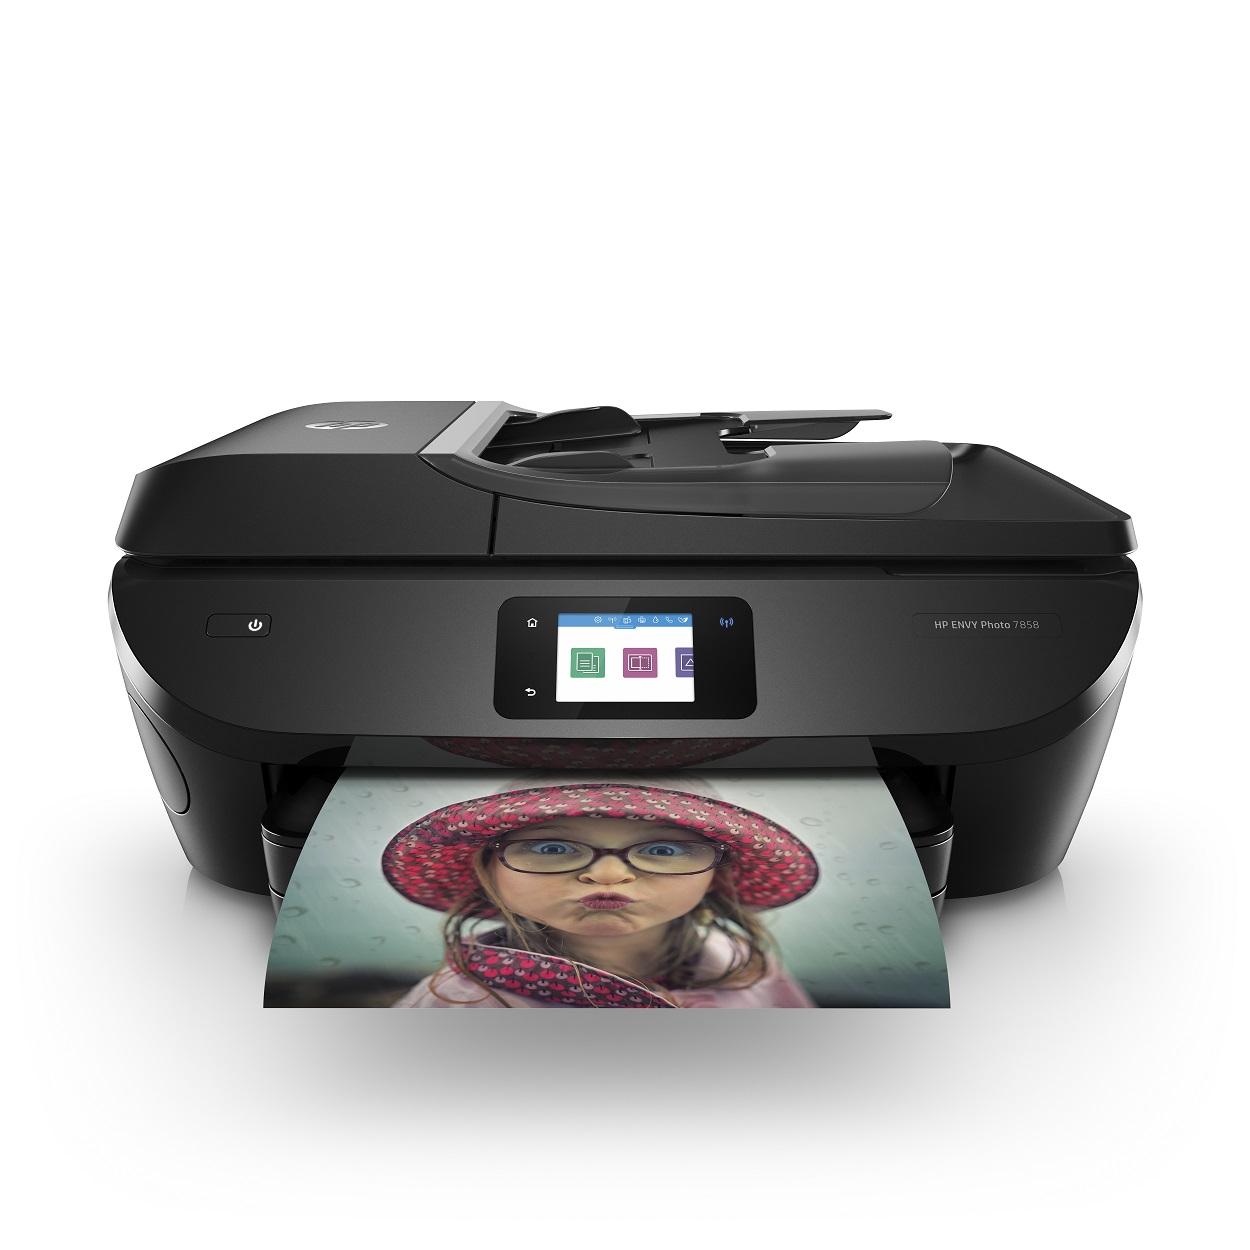 La stampante HP ENVY Photo pensata per gli studenti thumbnail